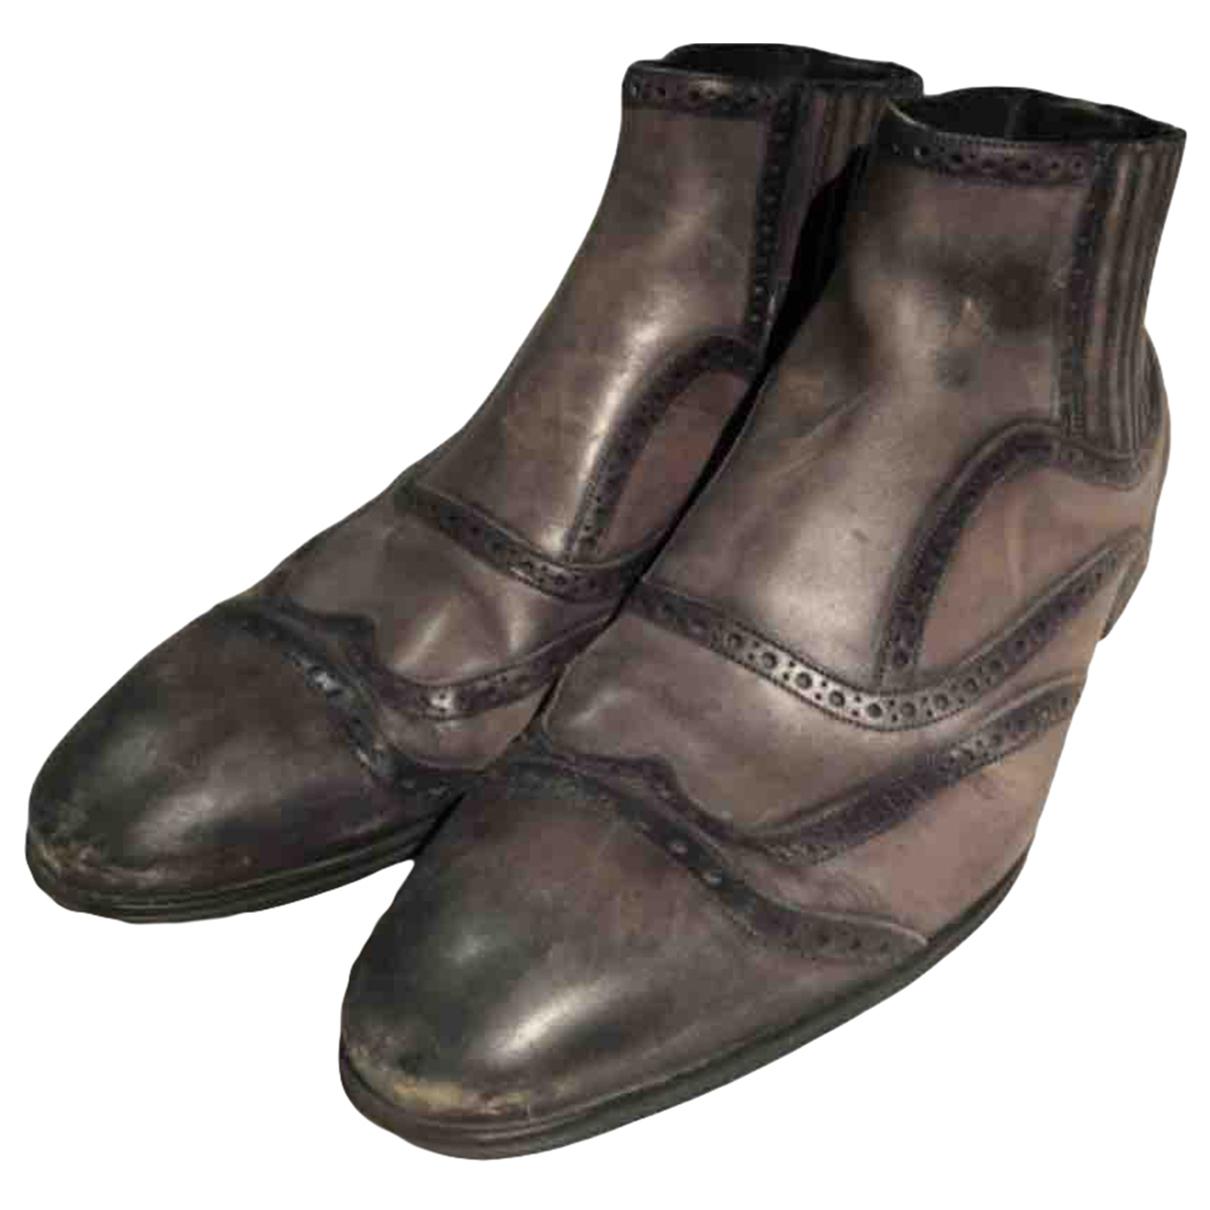 Dolce & Gabbana \N Stiefel in  Anthrazit Leder